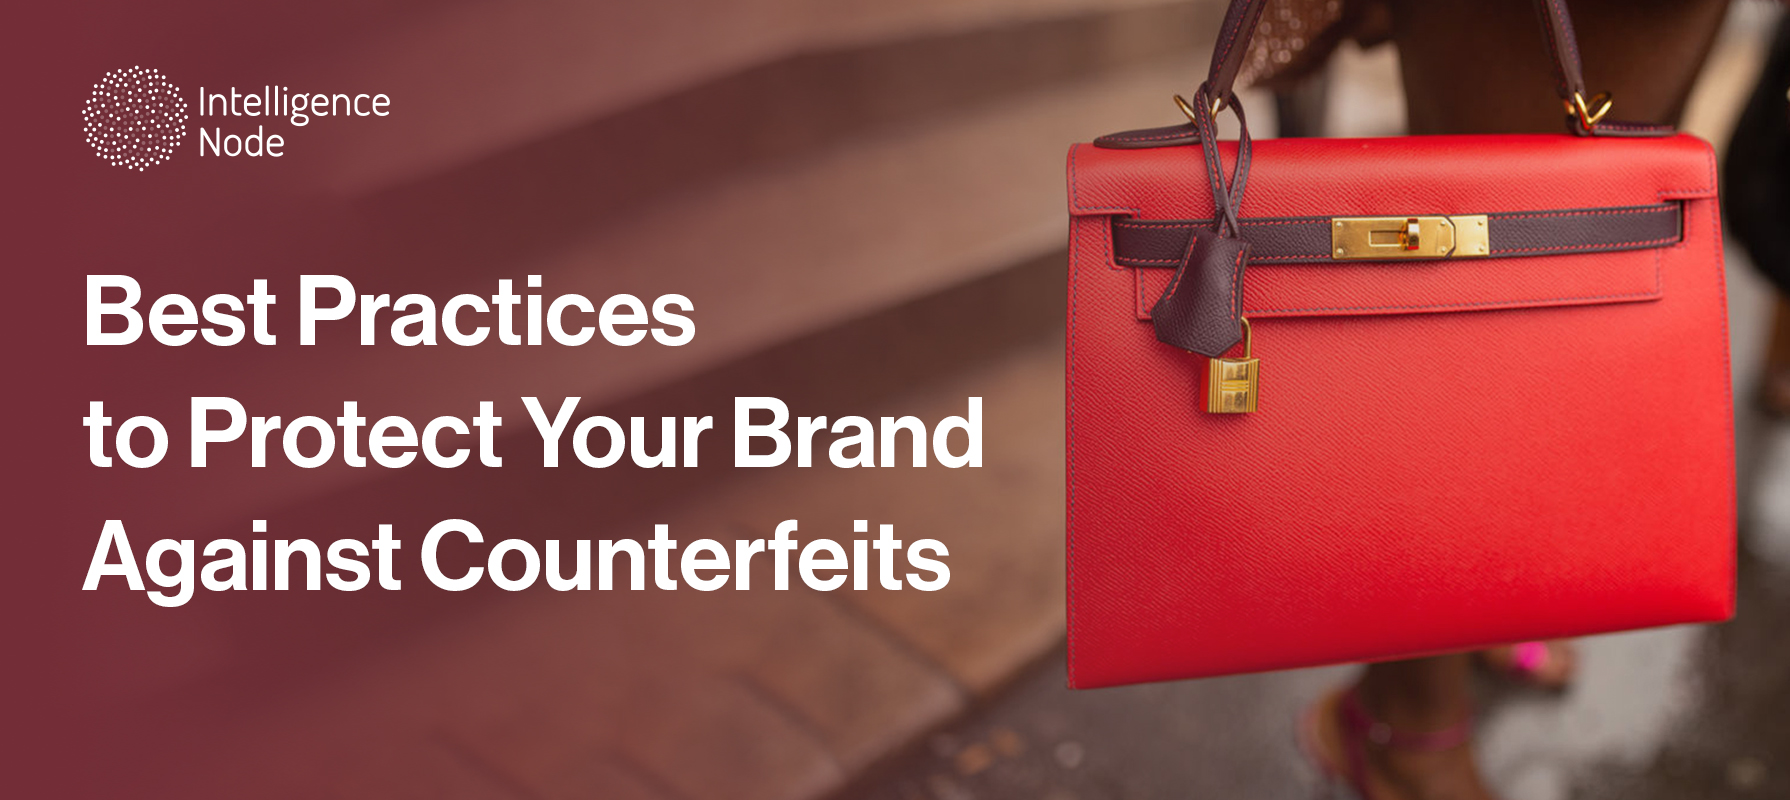 counterfeit attack retail best practices